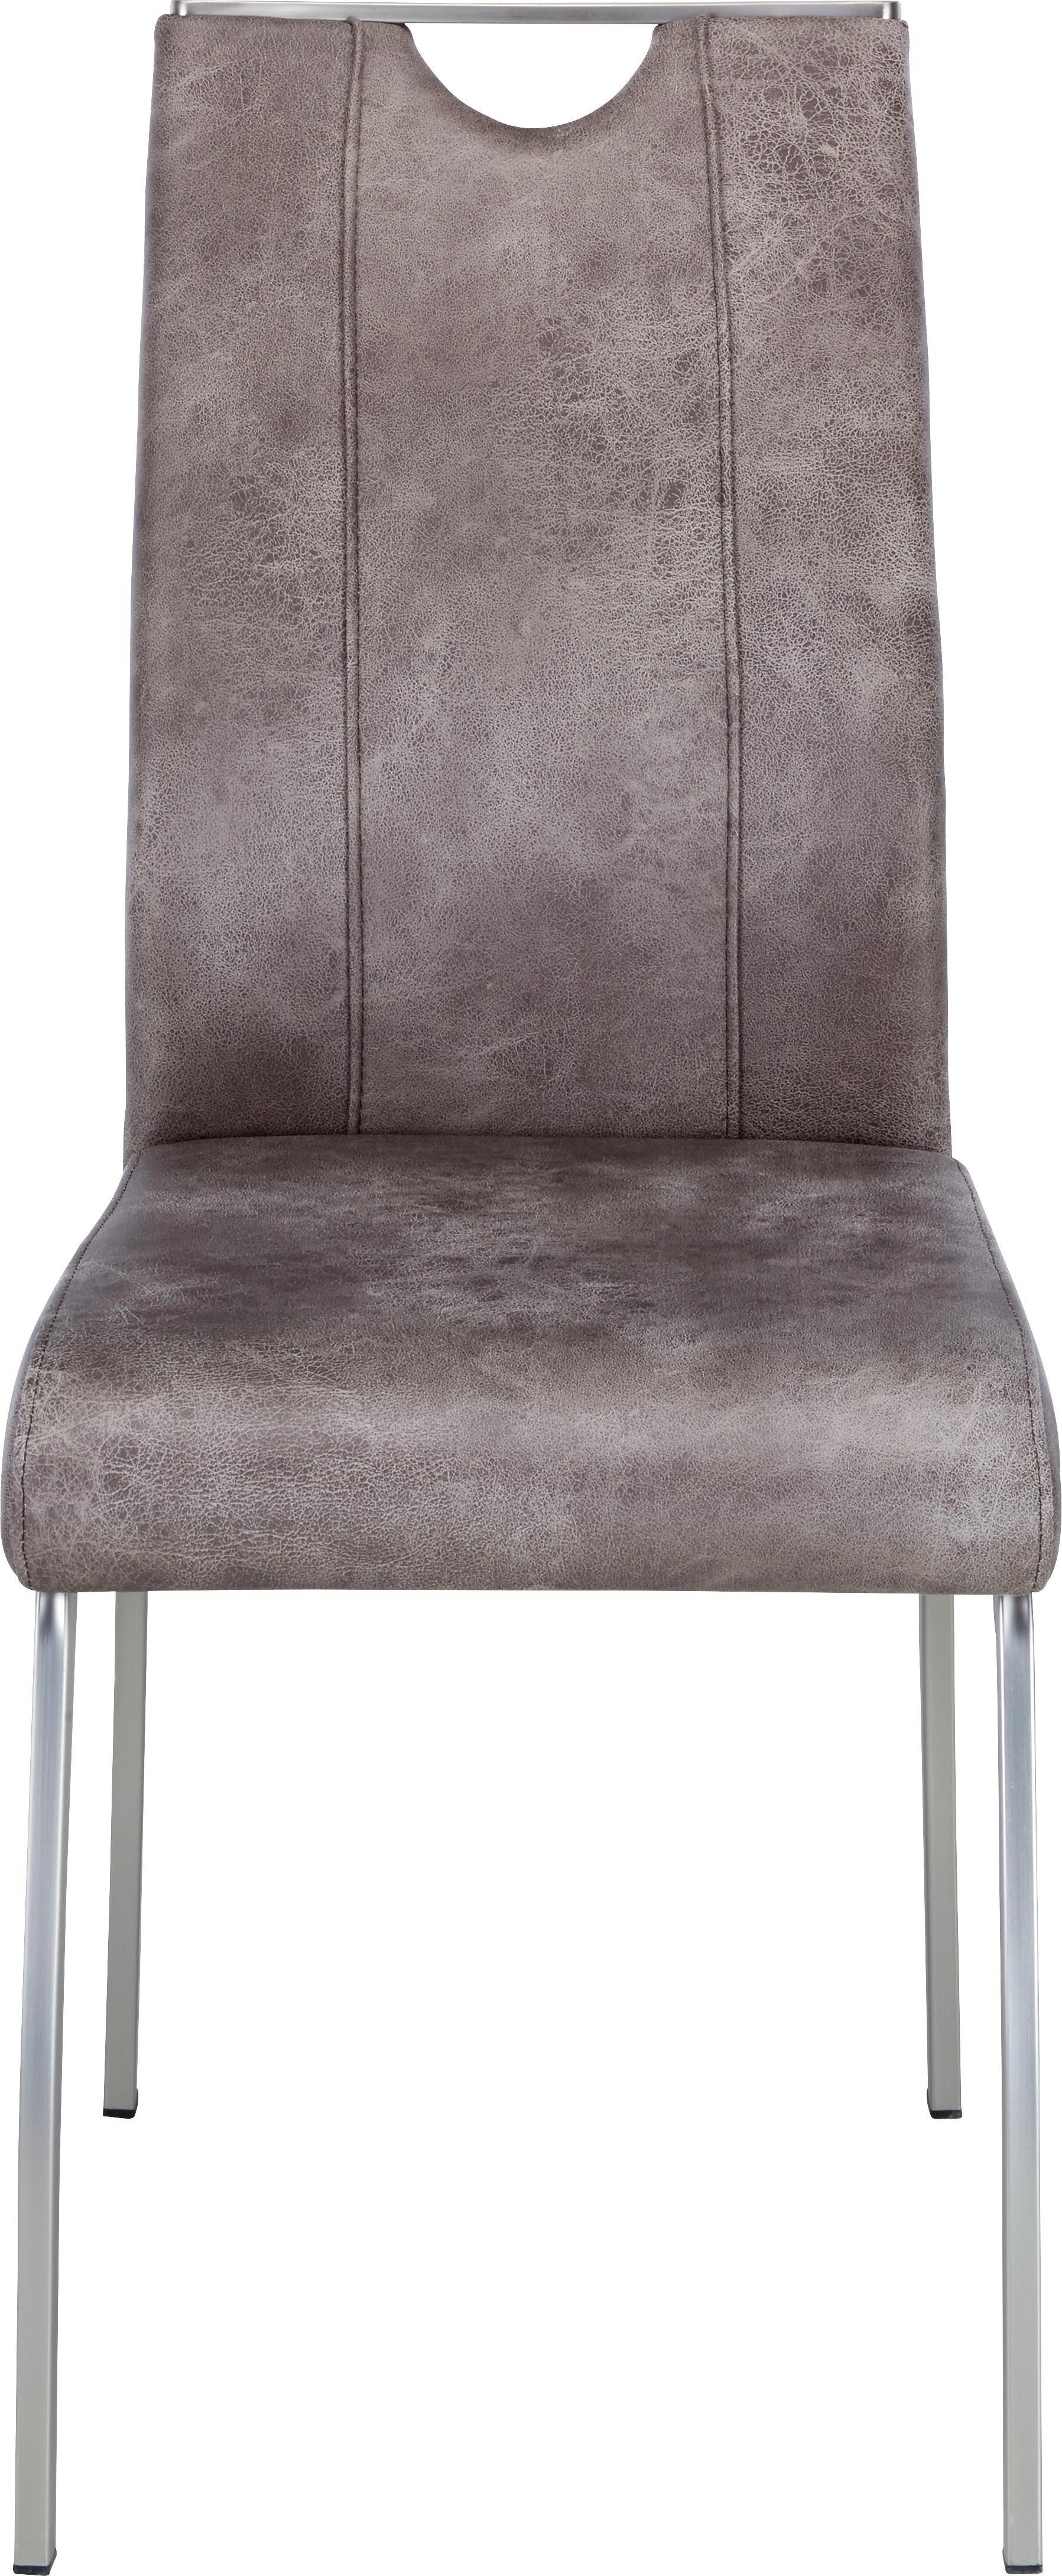 Stuhl in Edelstahloptik - MODERN, Kunststoff/Metall (43/102/58cm) - MÖMAX modern living